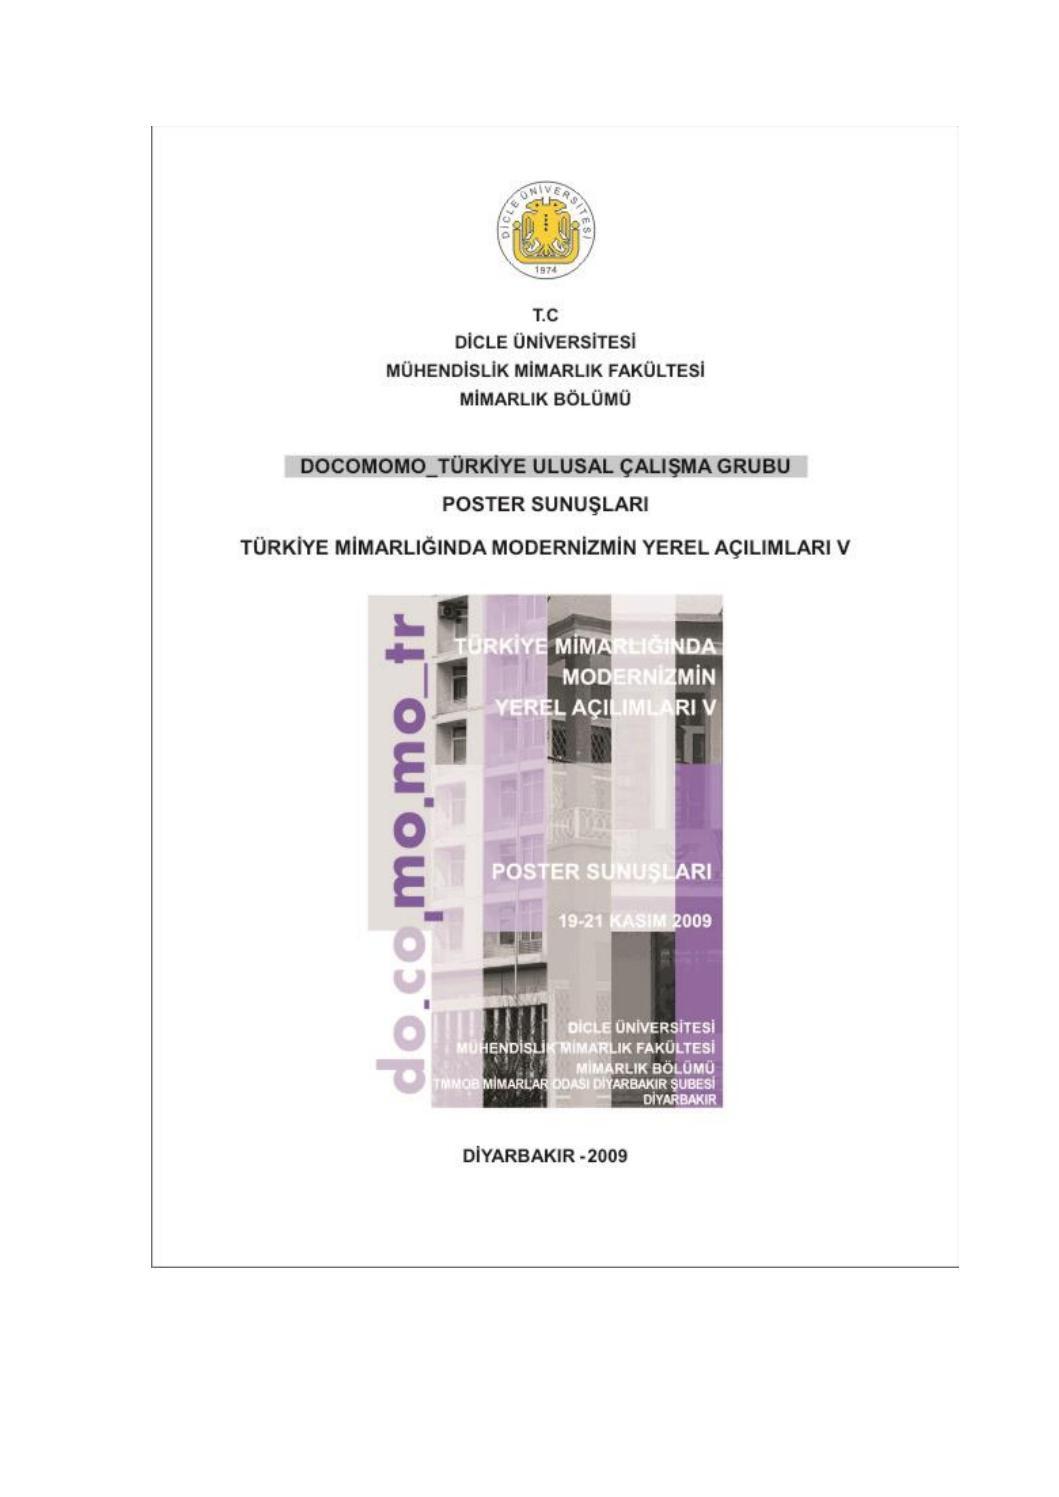 2009 Turkiye Mimarliginda Modernizmin Yerel Acilimlari V By